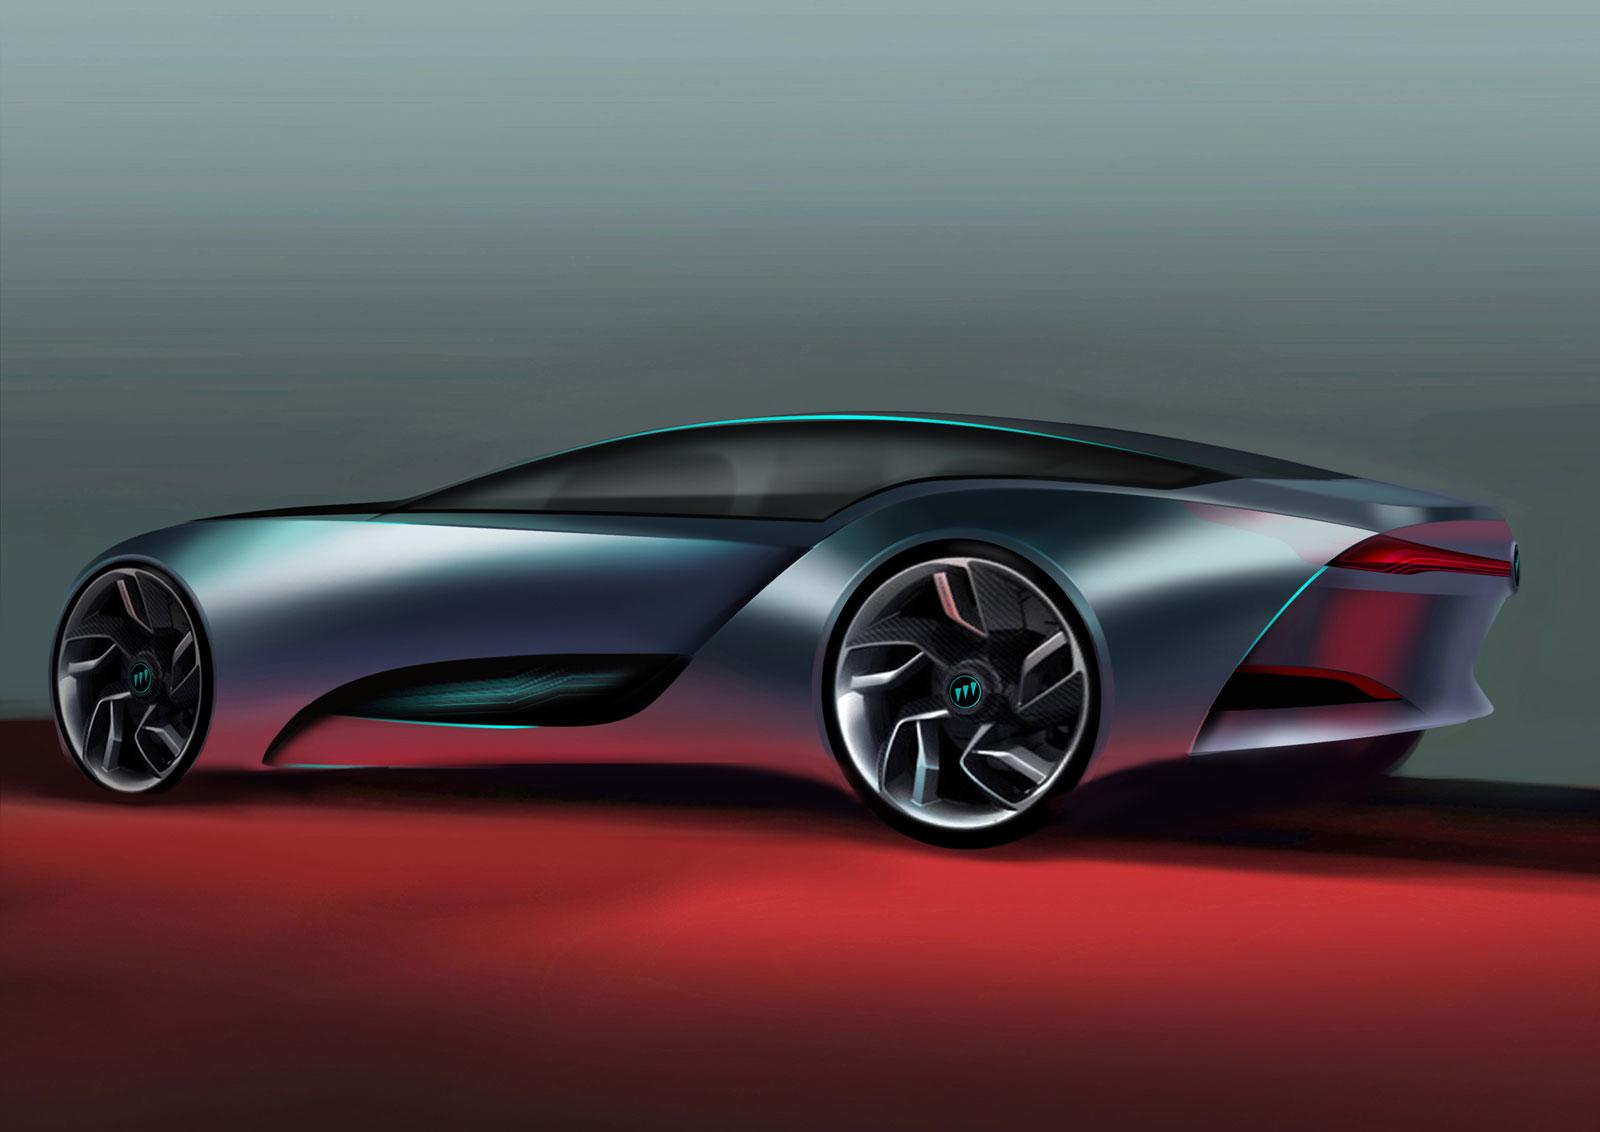 Buick Riviera Concept Design Sketch - Car Body Design